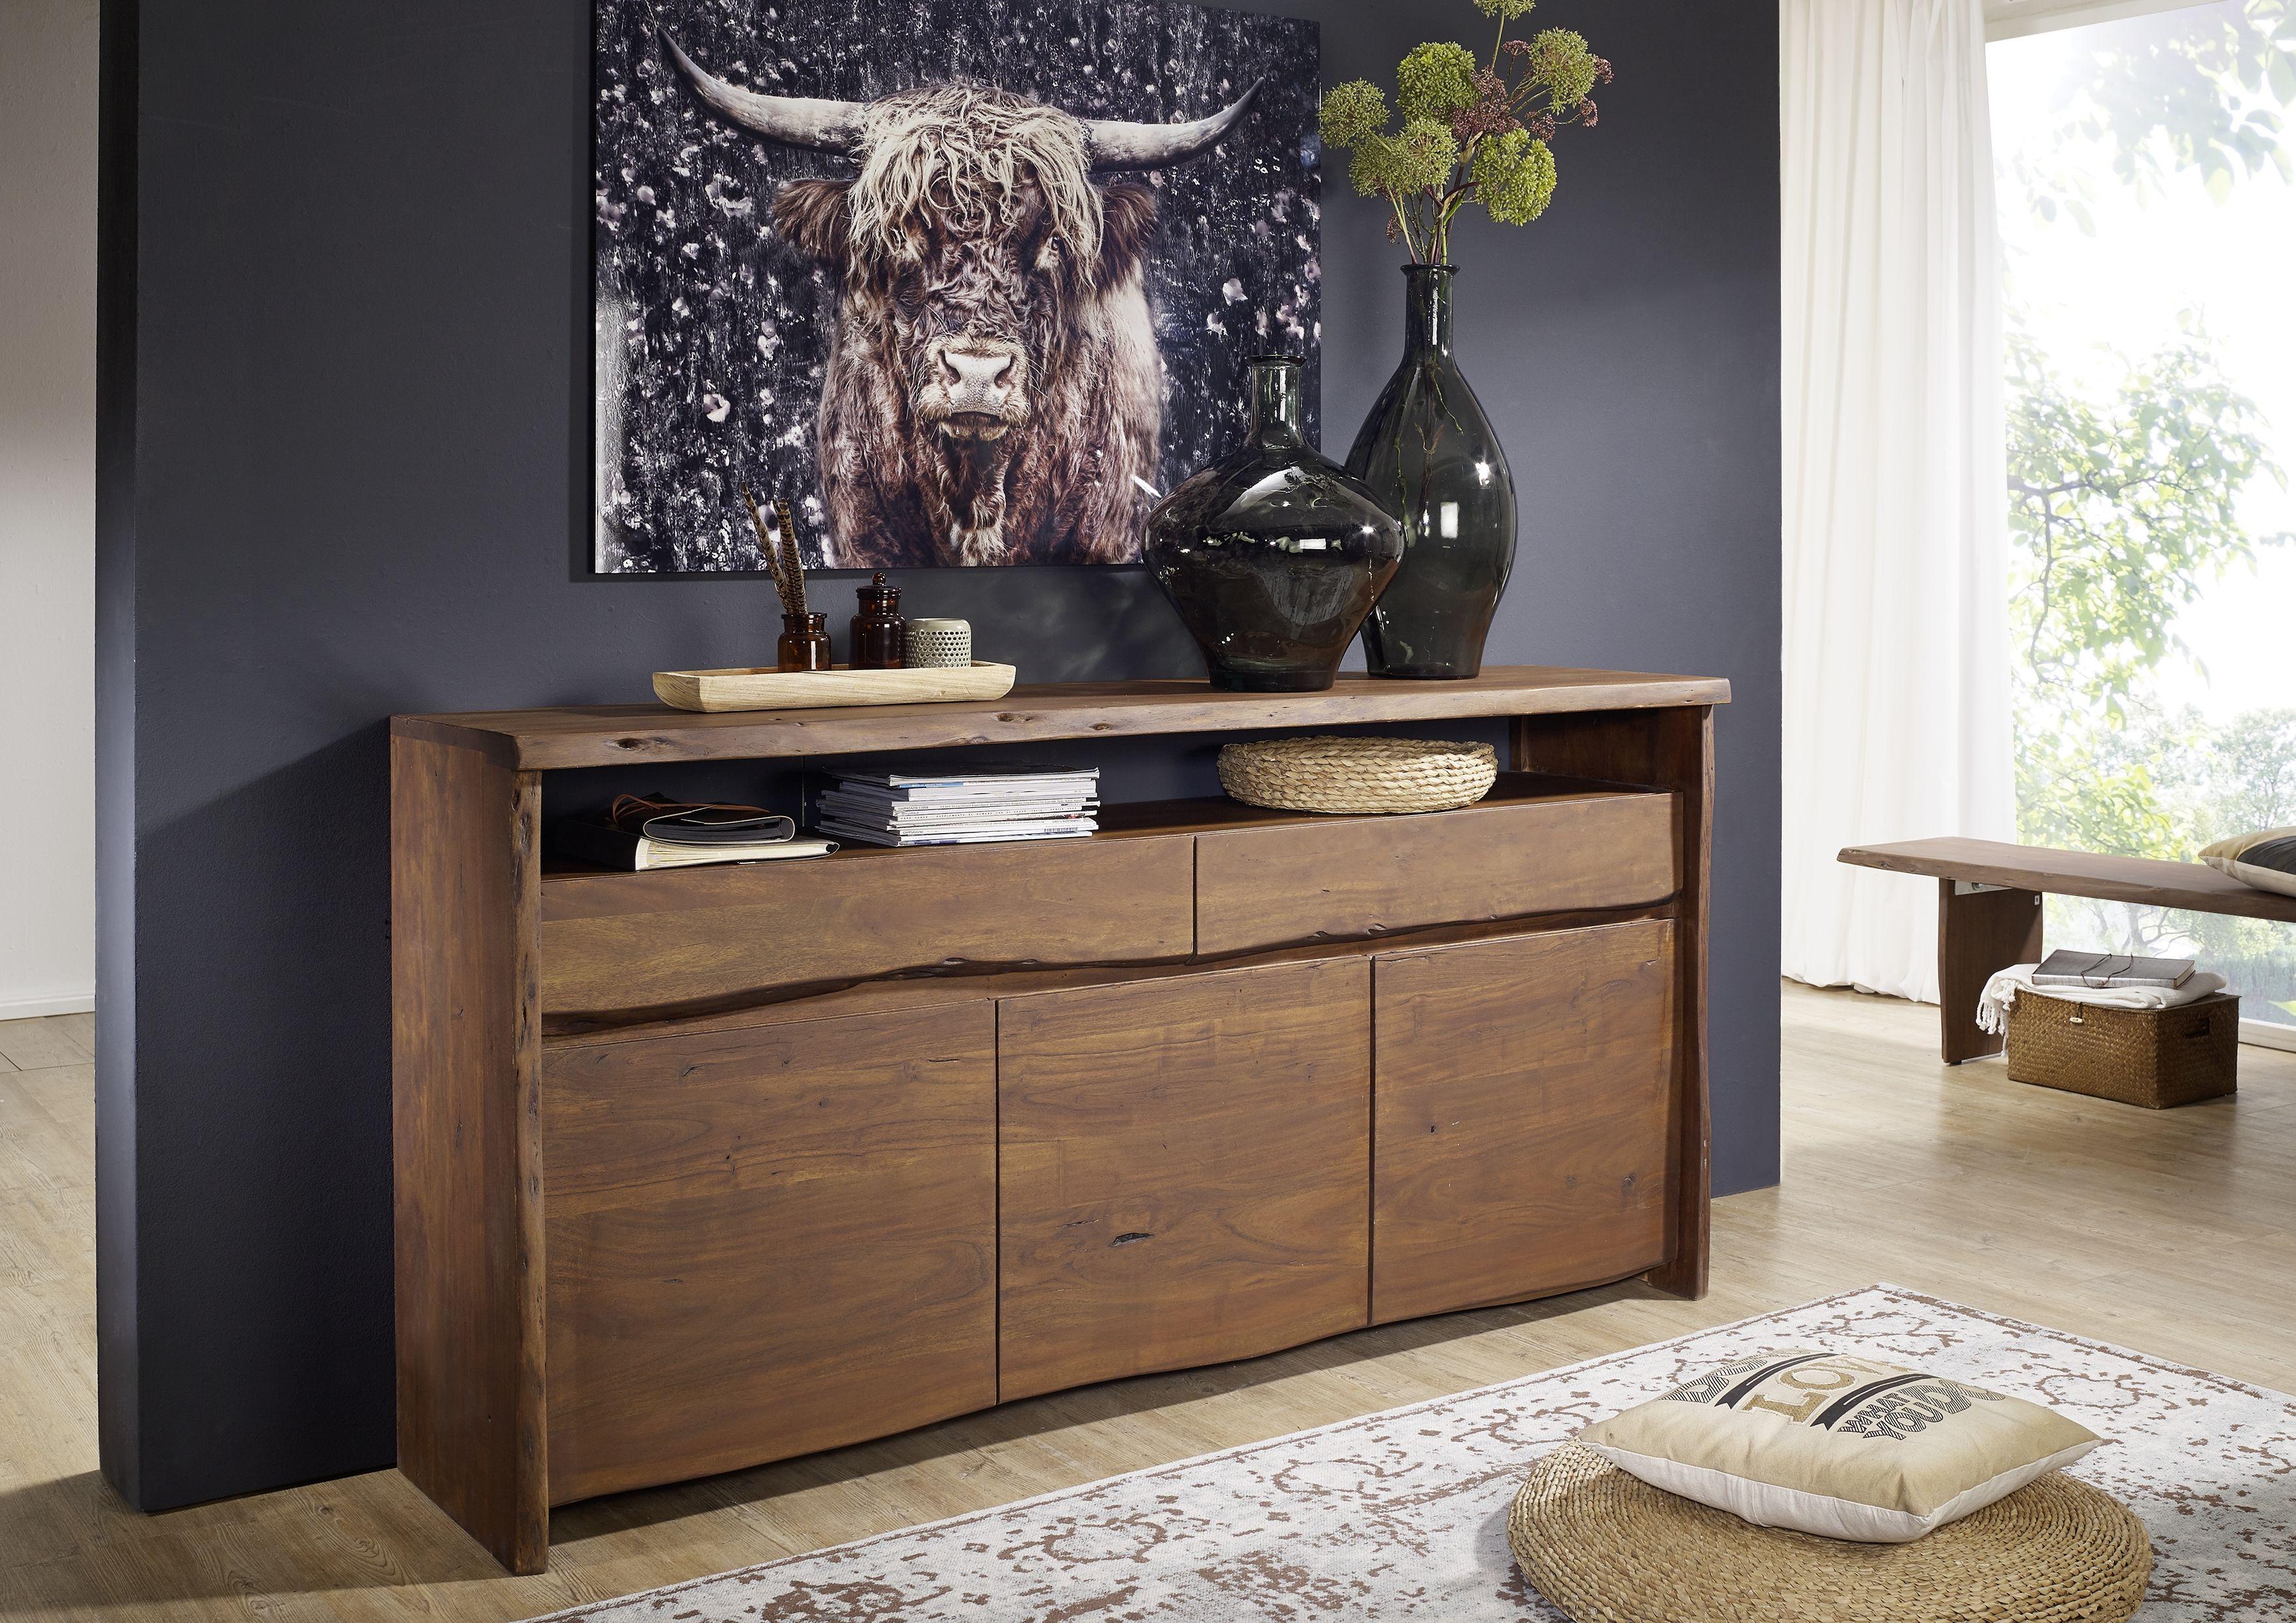 Wohnzimmer Kommode ~ Kommode aus akazienholz mit naturkantenoptik live edge